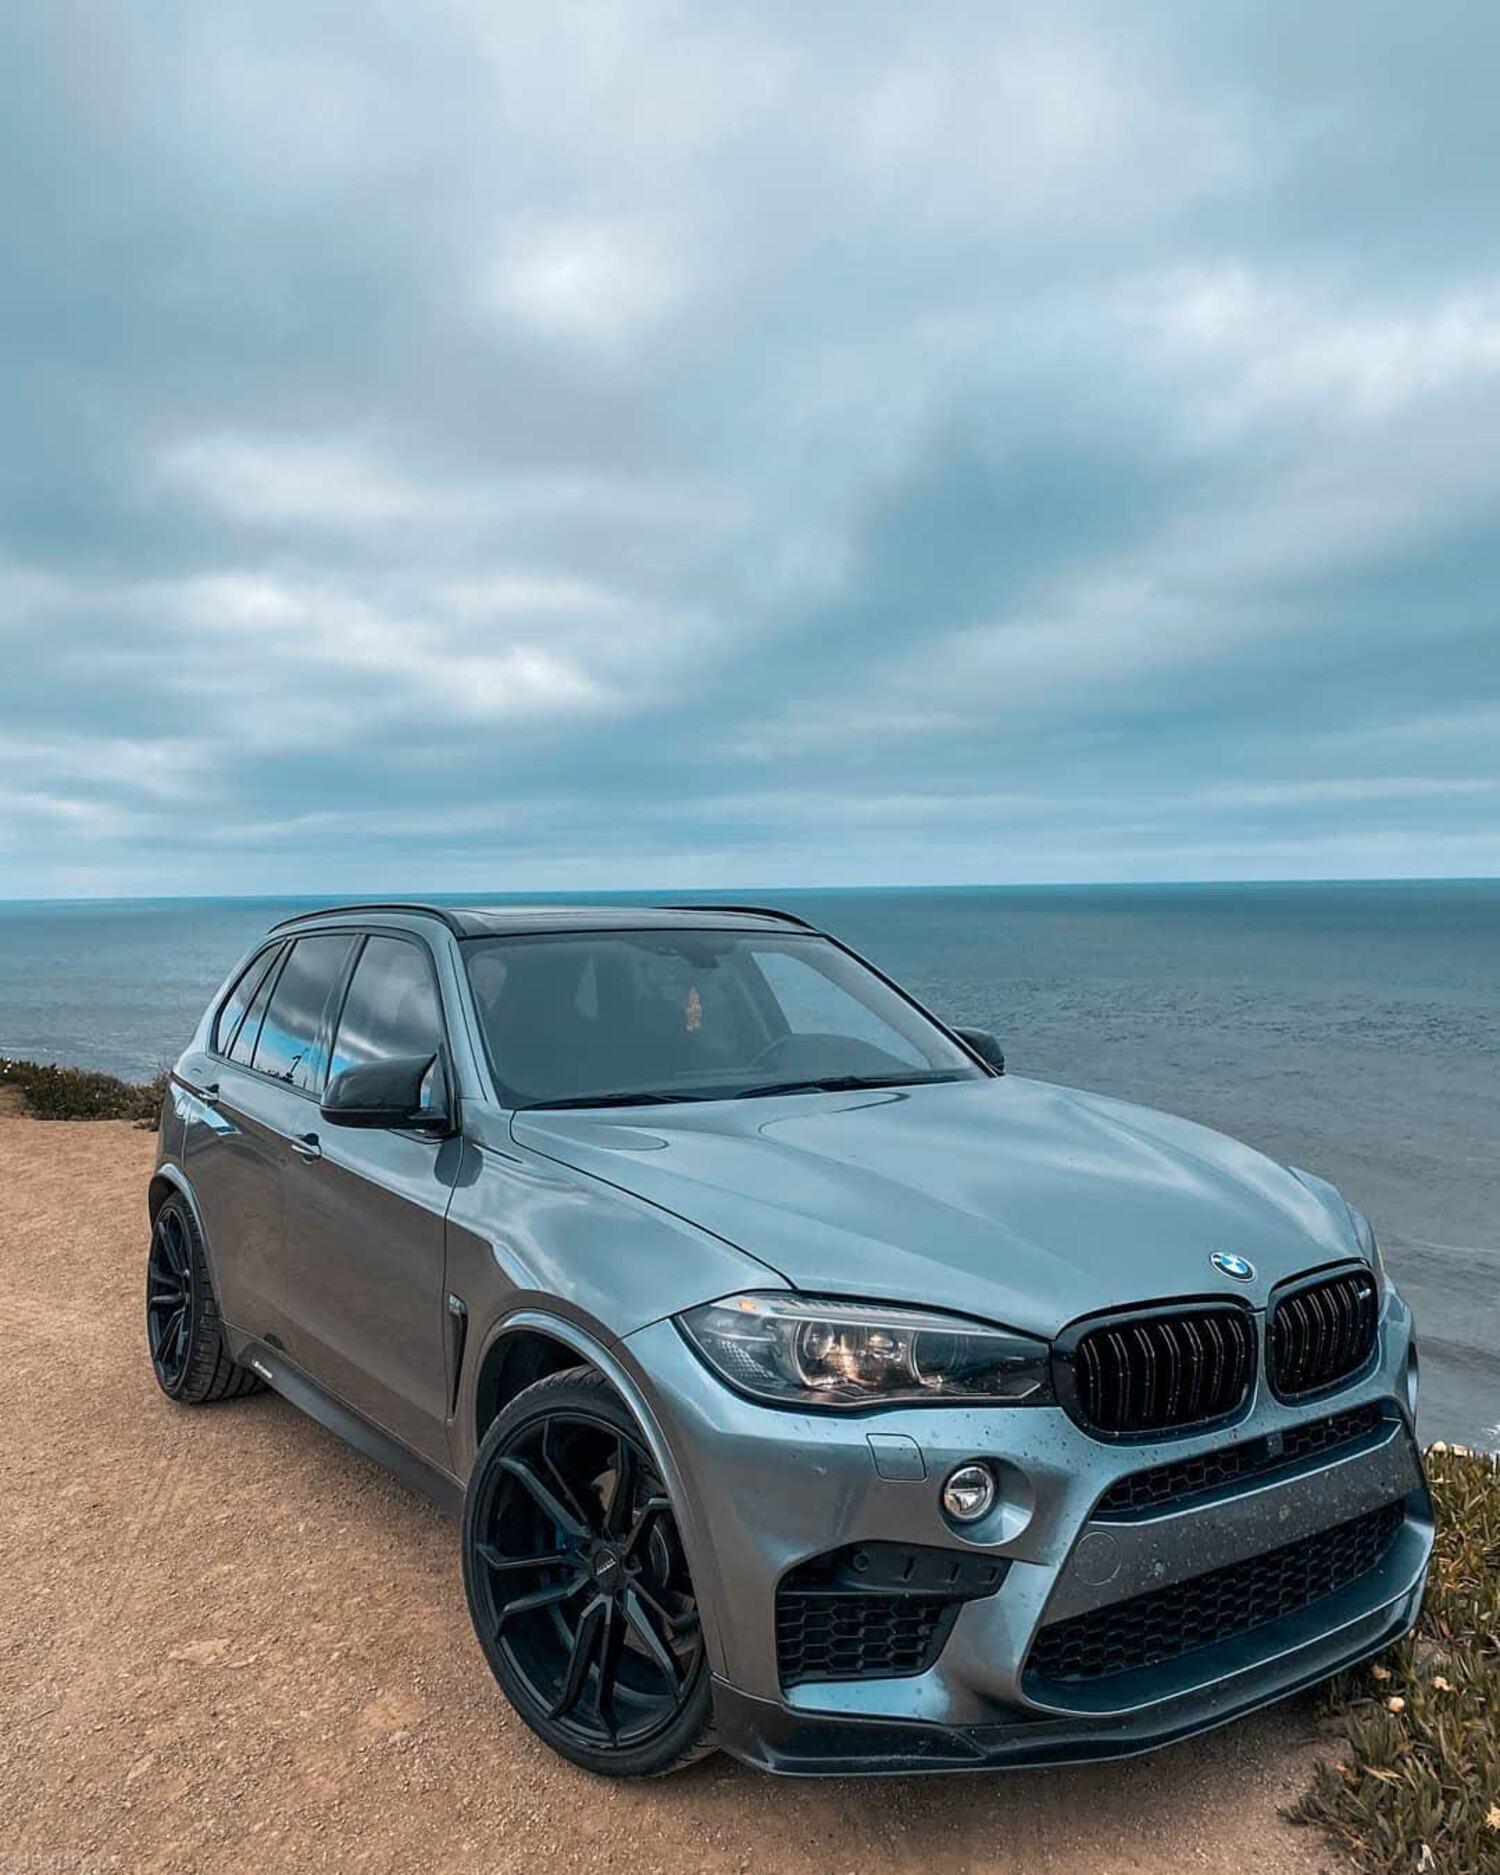 BMW-X5F15-ToutsurlAdBlue-5.jpg